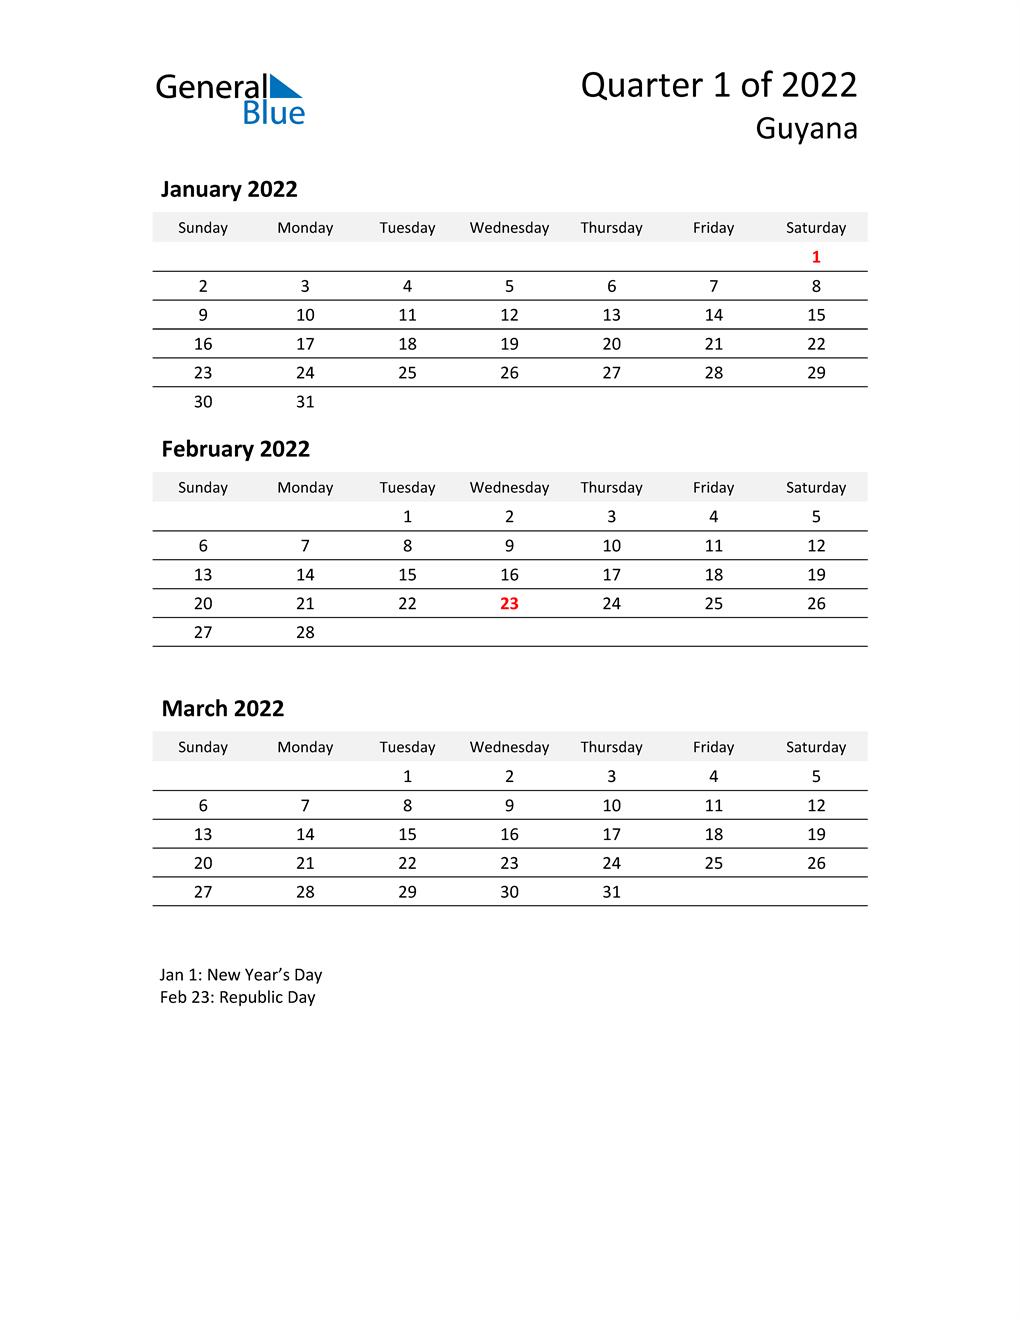 2022 Three-Month Calendar for Guyana